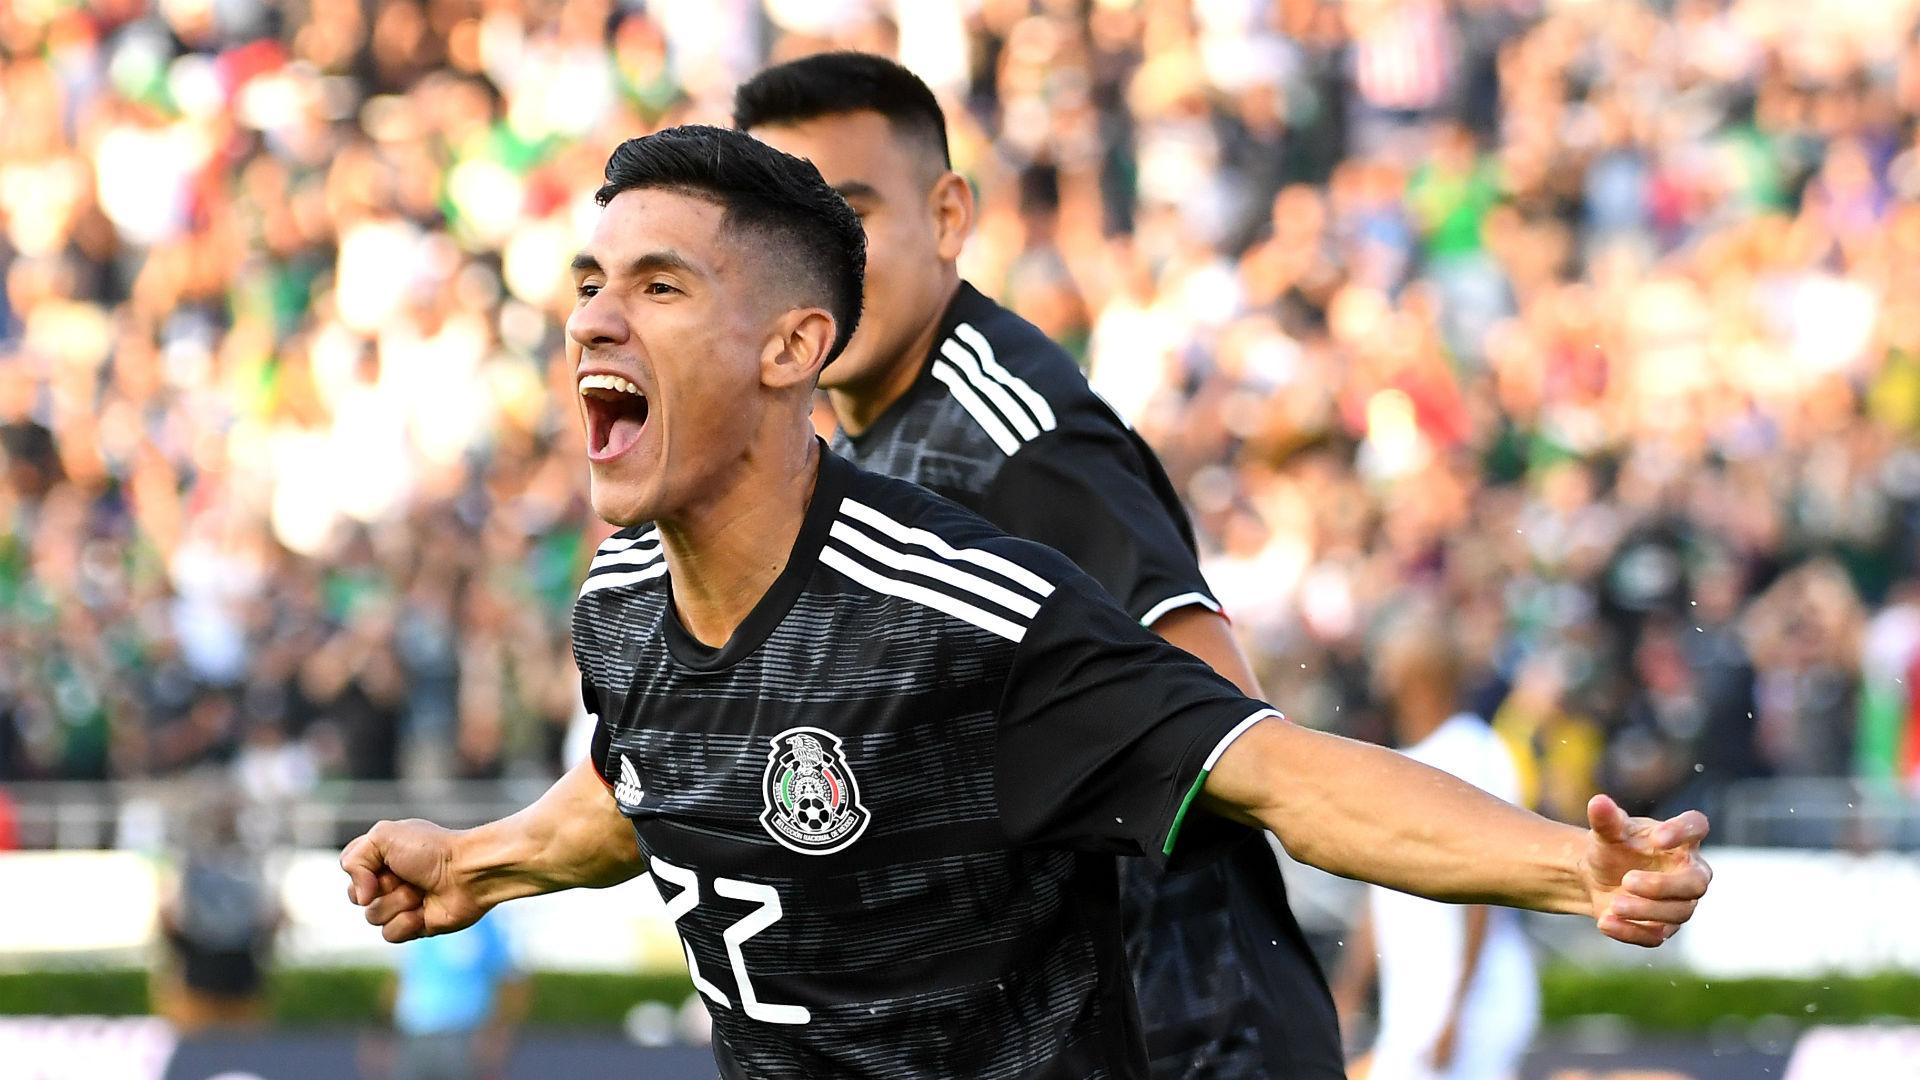 Meksika, Küba'ya gol olup yağdı: 7-0